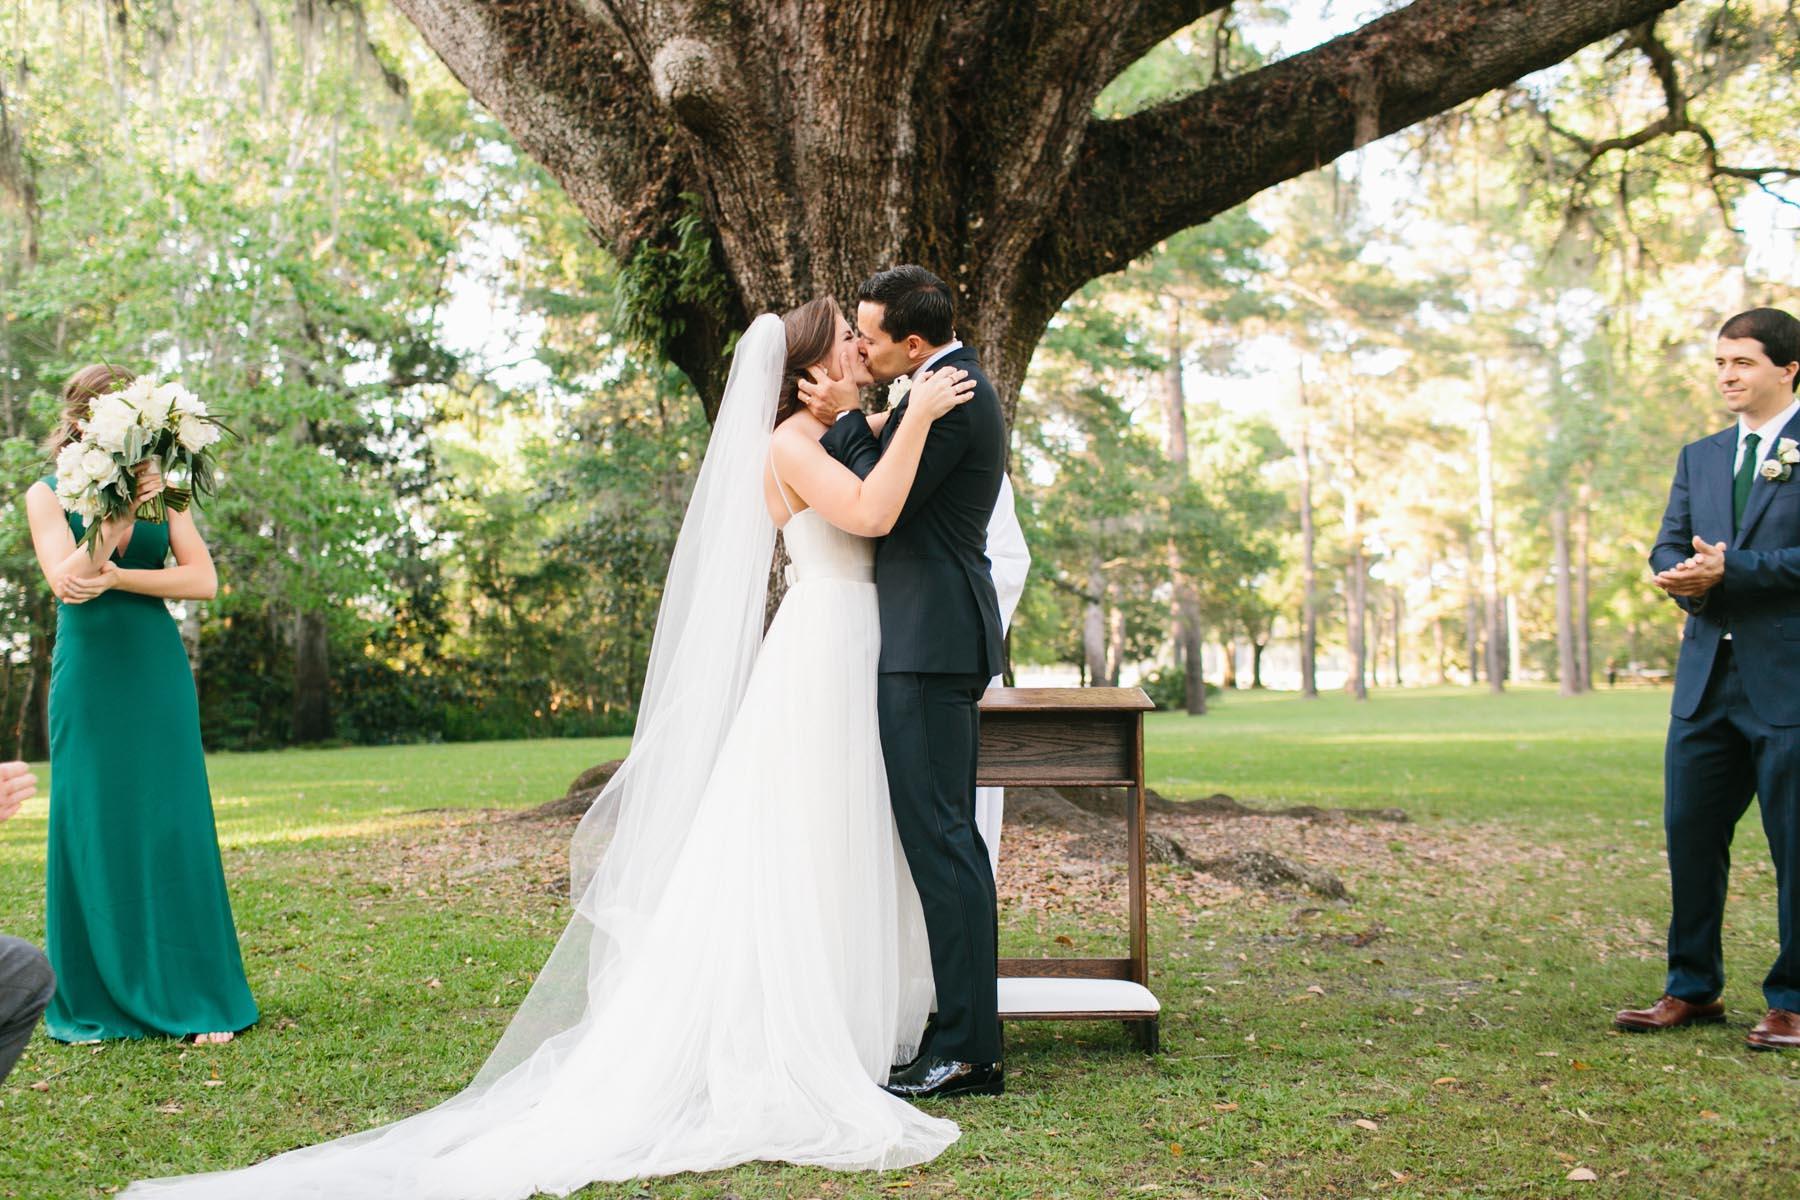 lowry wedding blog eden garden florida wedding-73